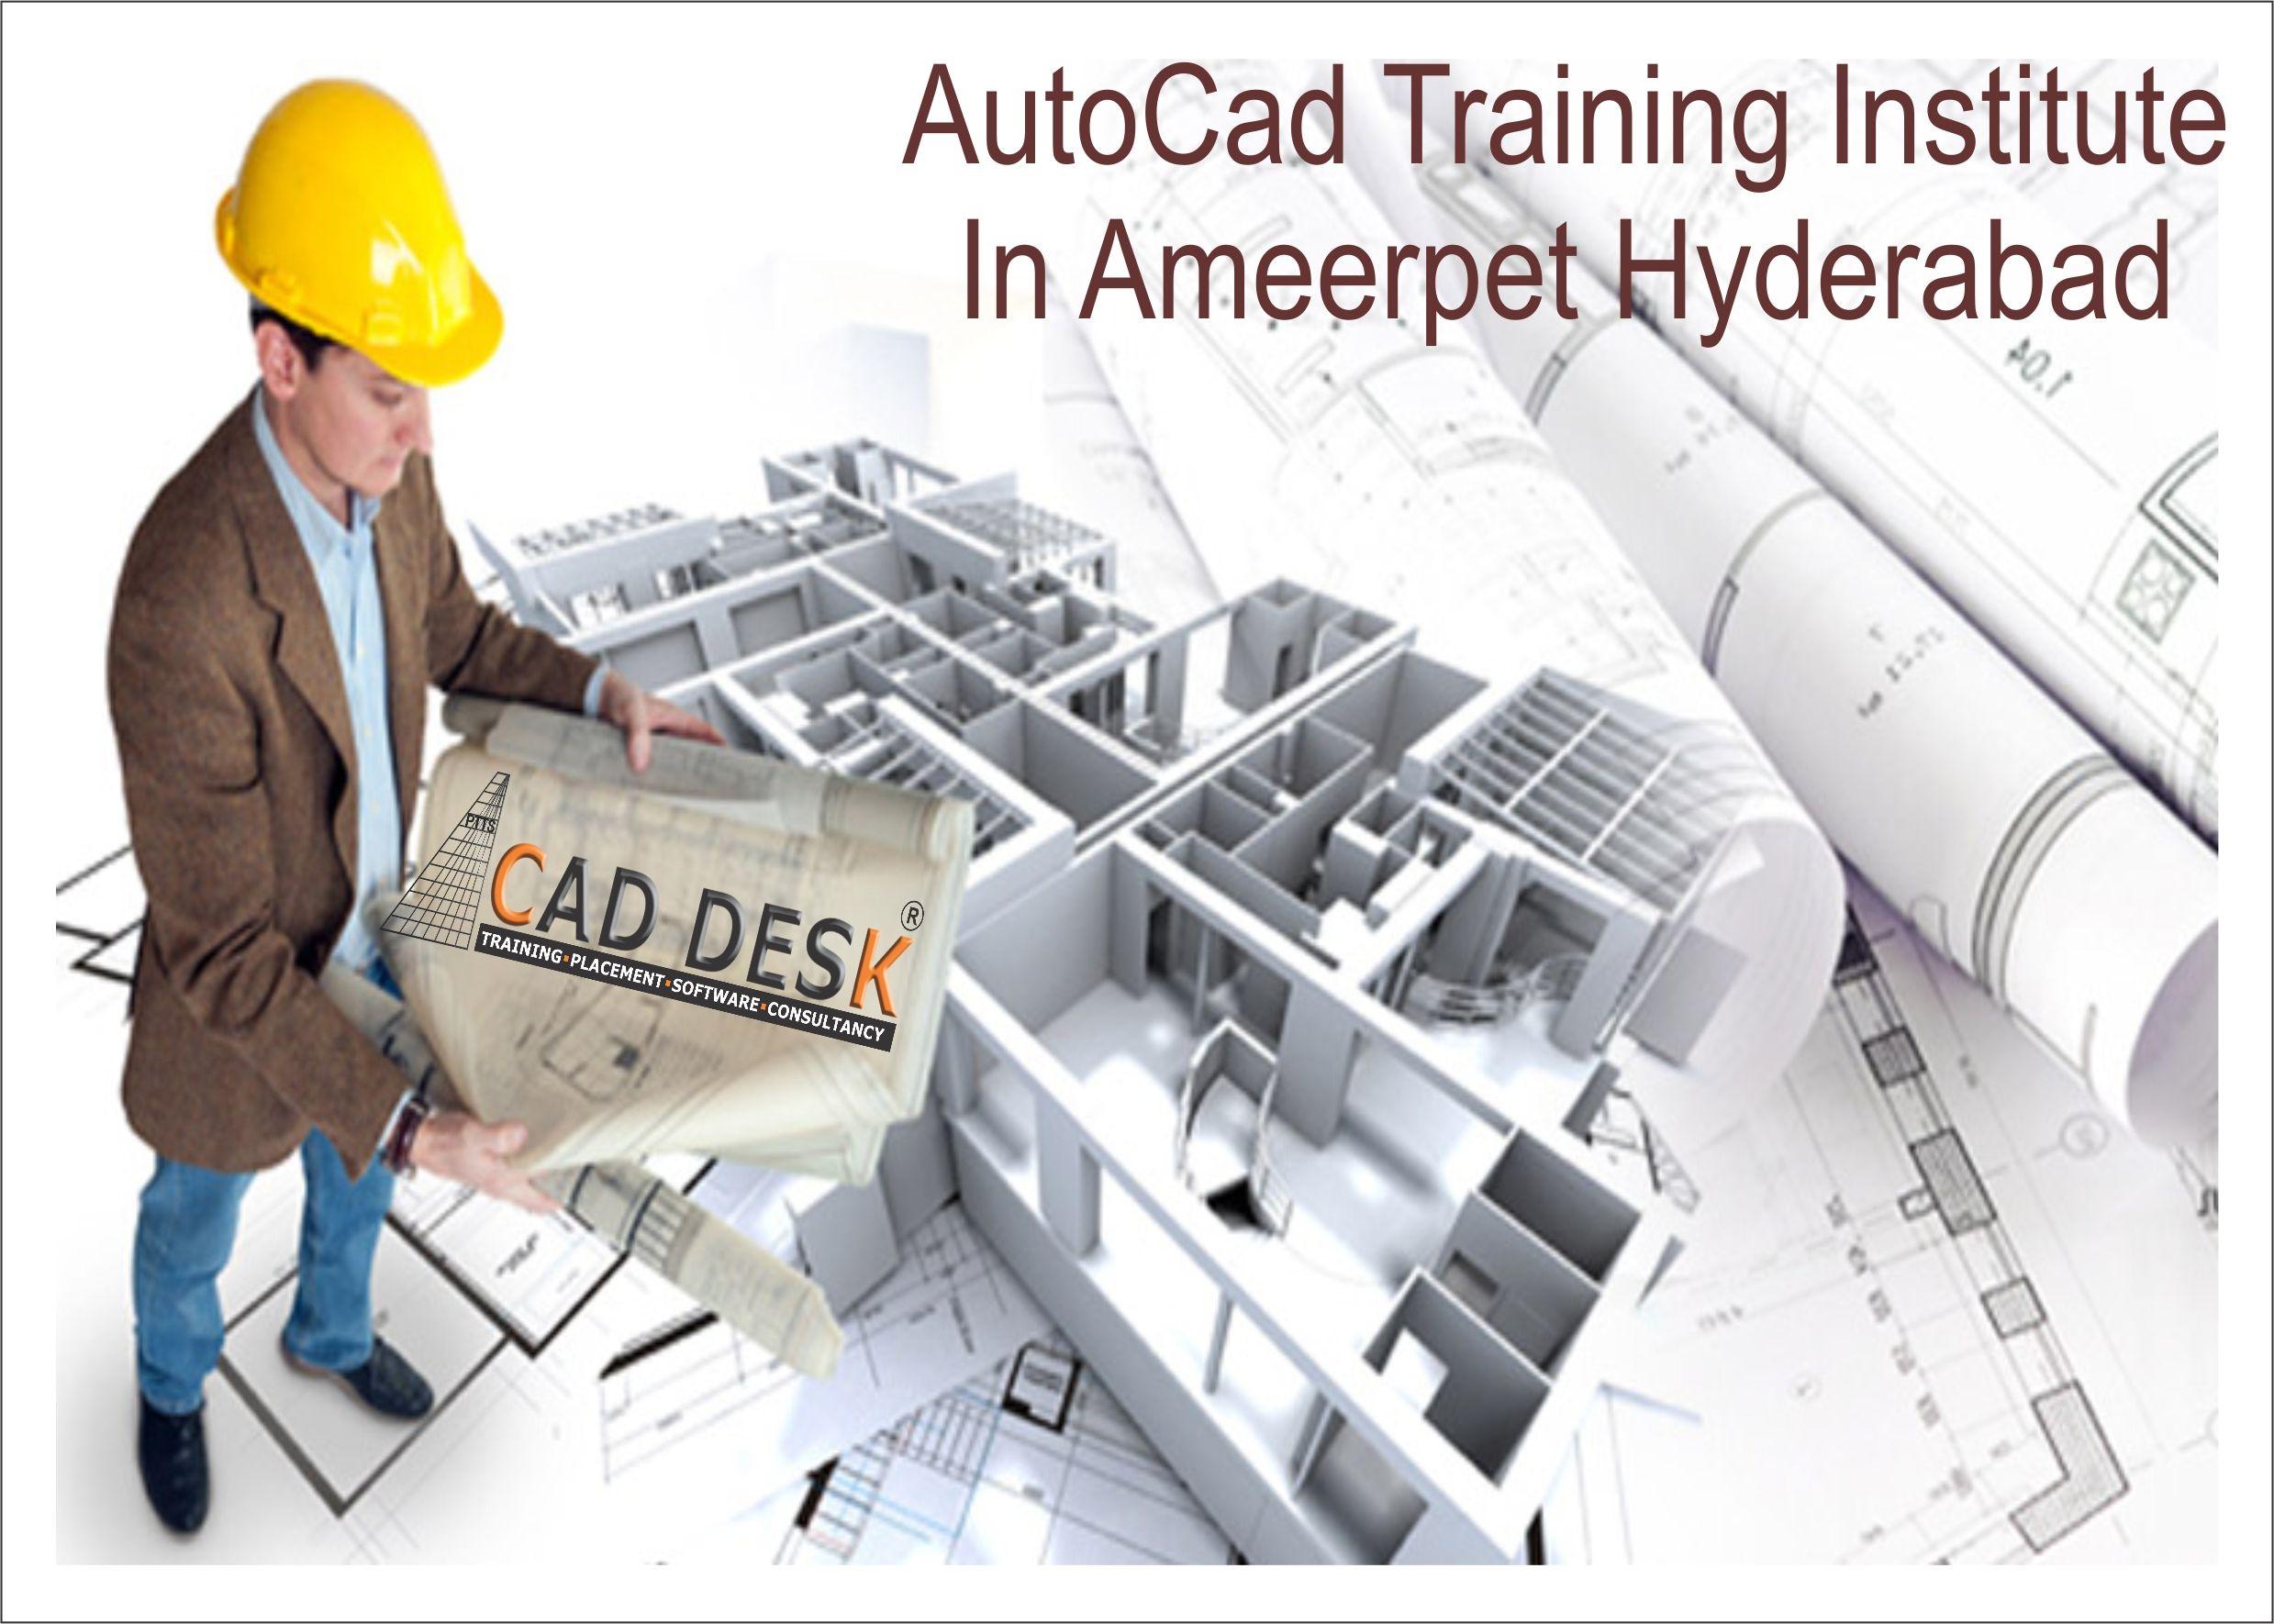 CAD DESK Ameerpet Hyderabad is Best AutoCad Training